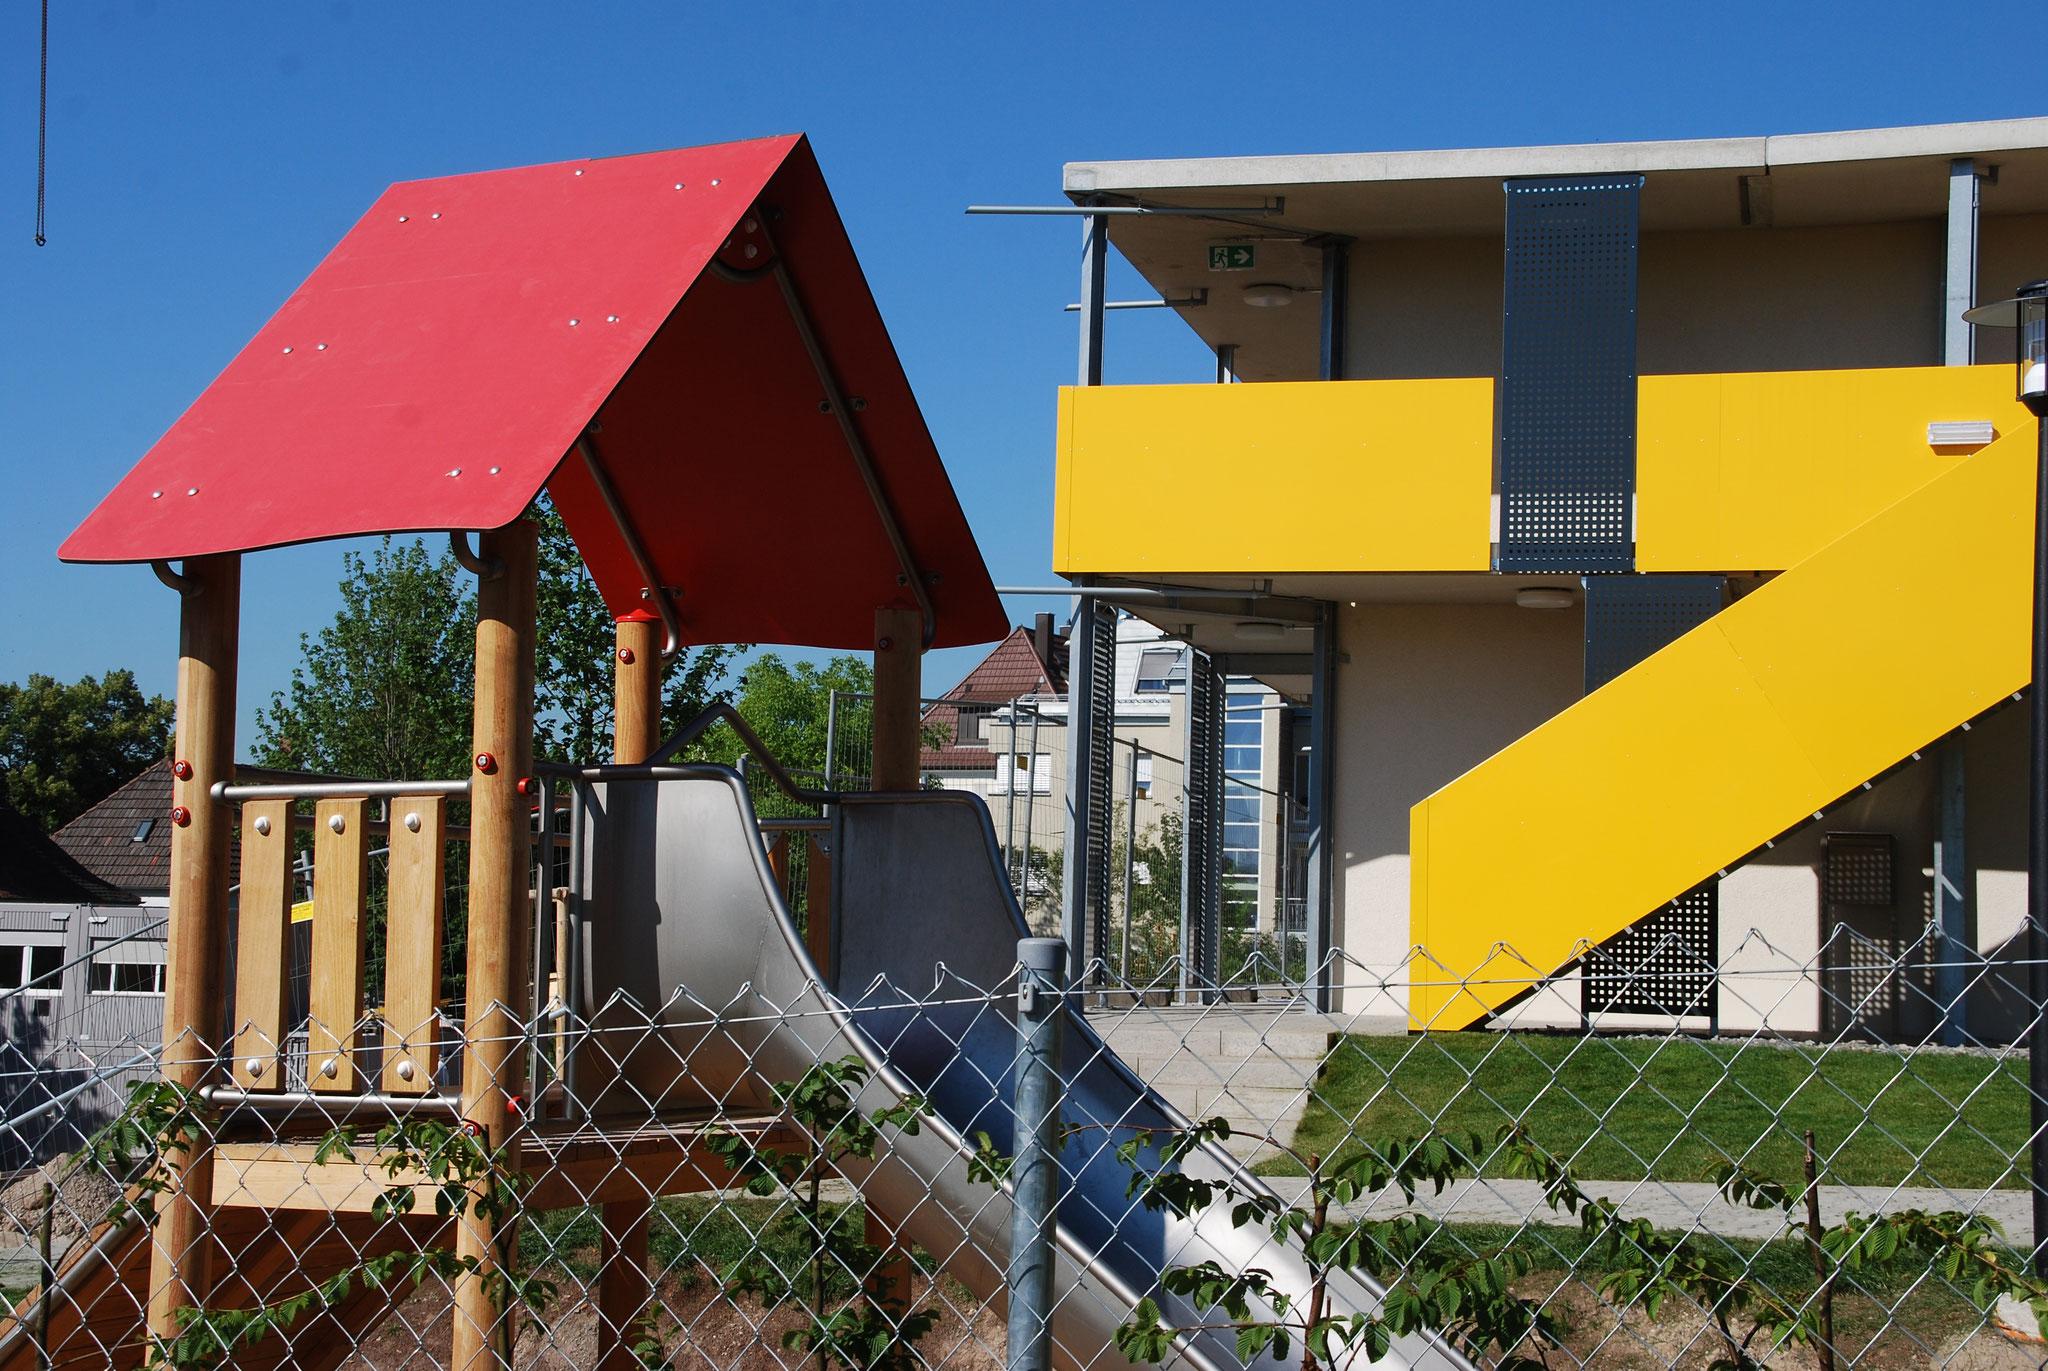 Bubenhalde 16 mit Kinderhaus